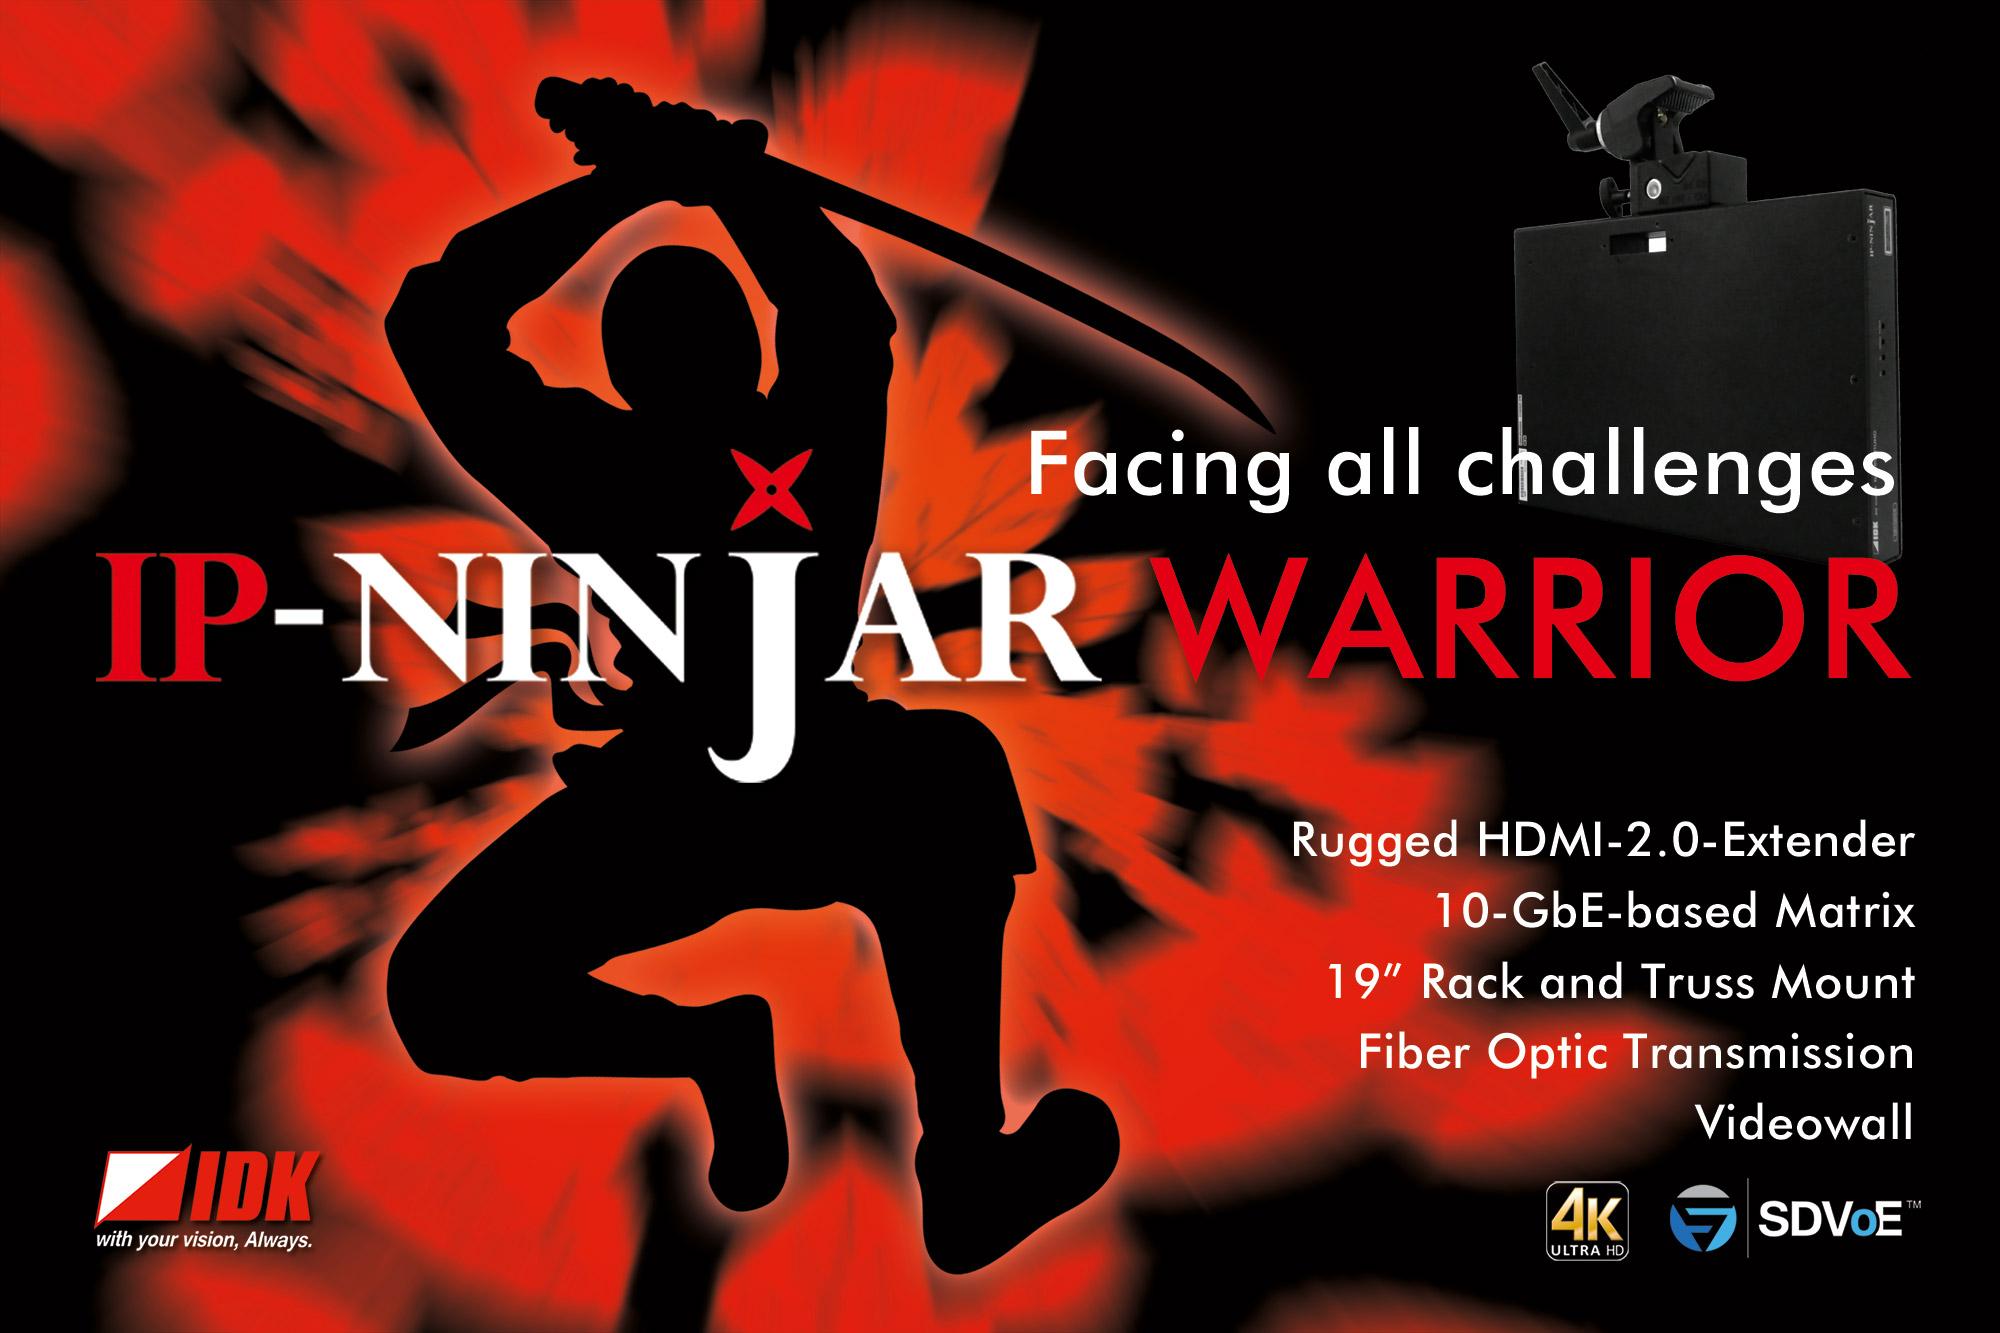 IP-NINJAR WARRIOR – Facing all Challenges